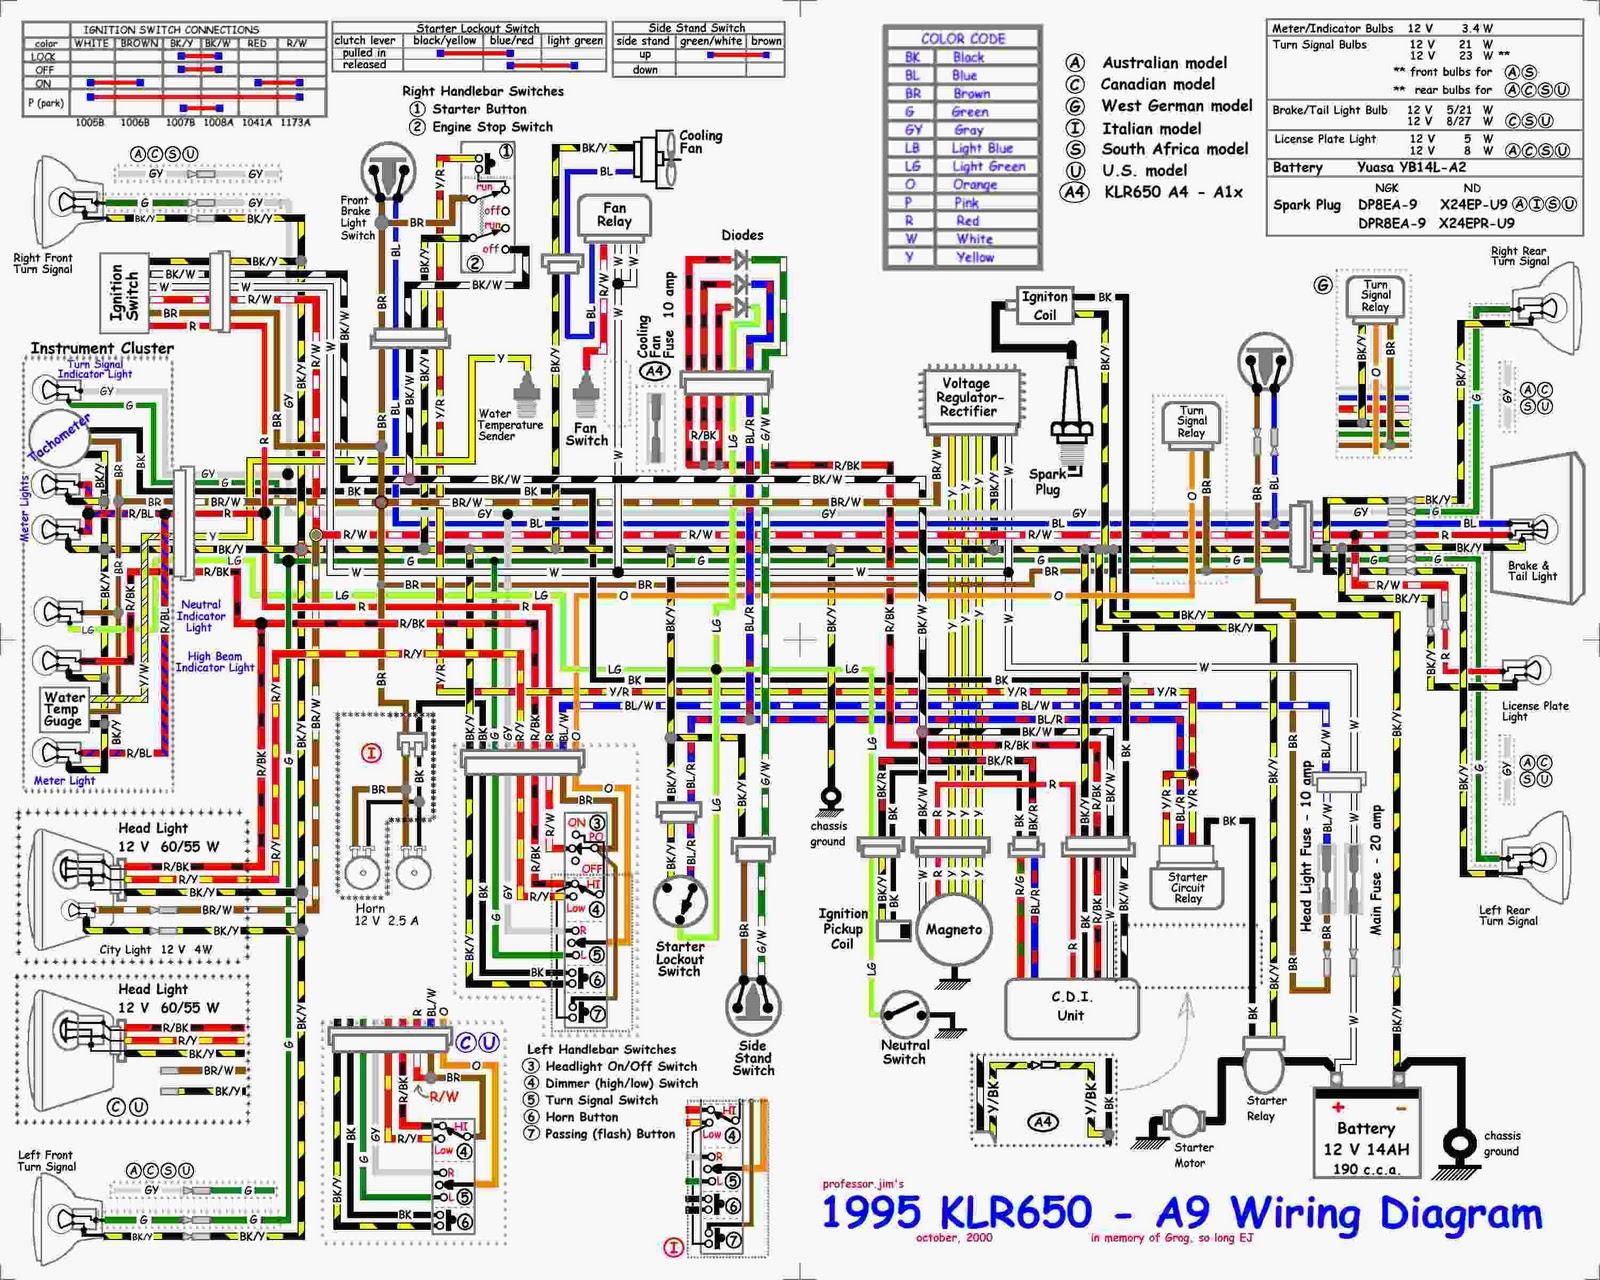 Wiring Diagram For Daihatsu Charade - Wiring Diagram Save on